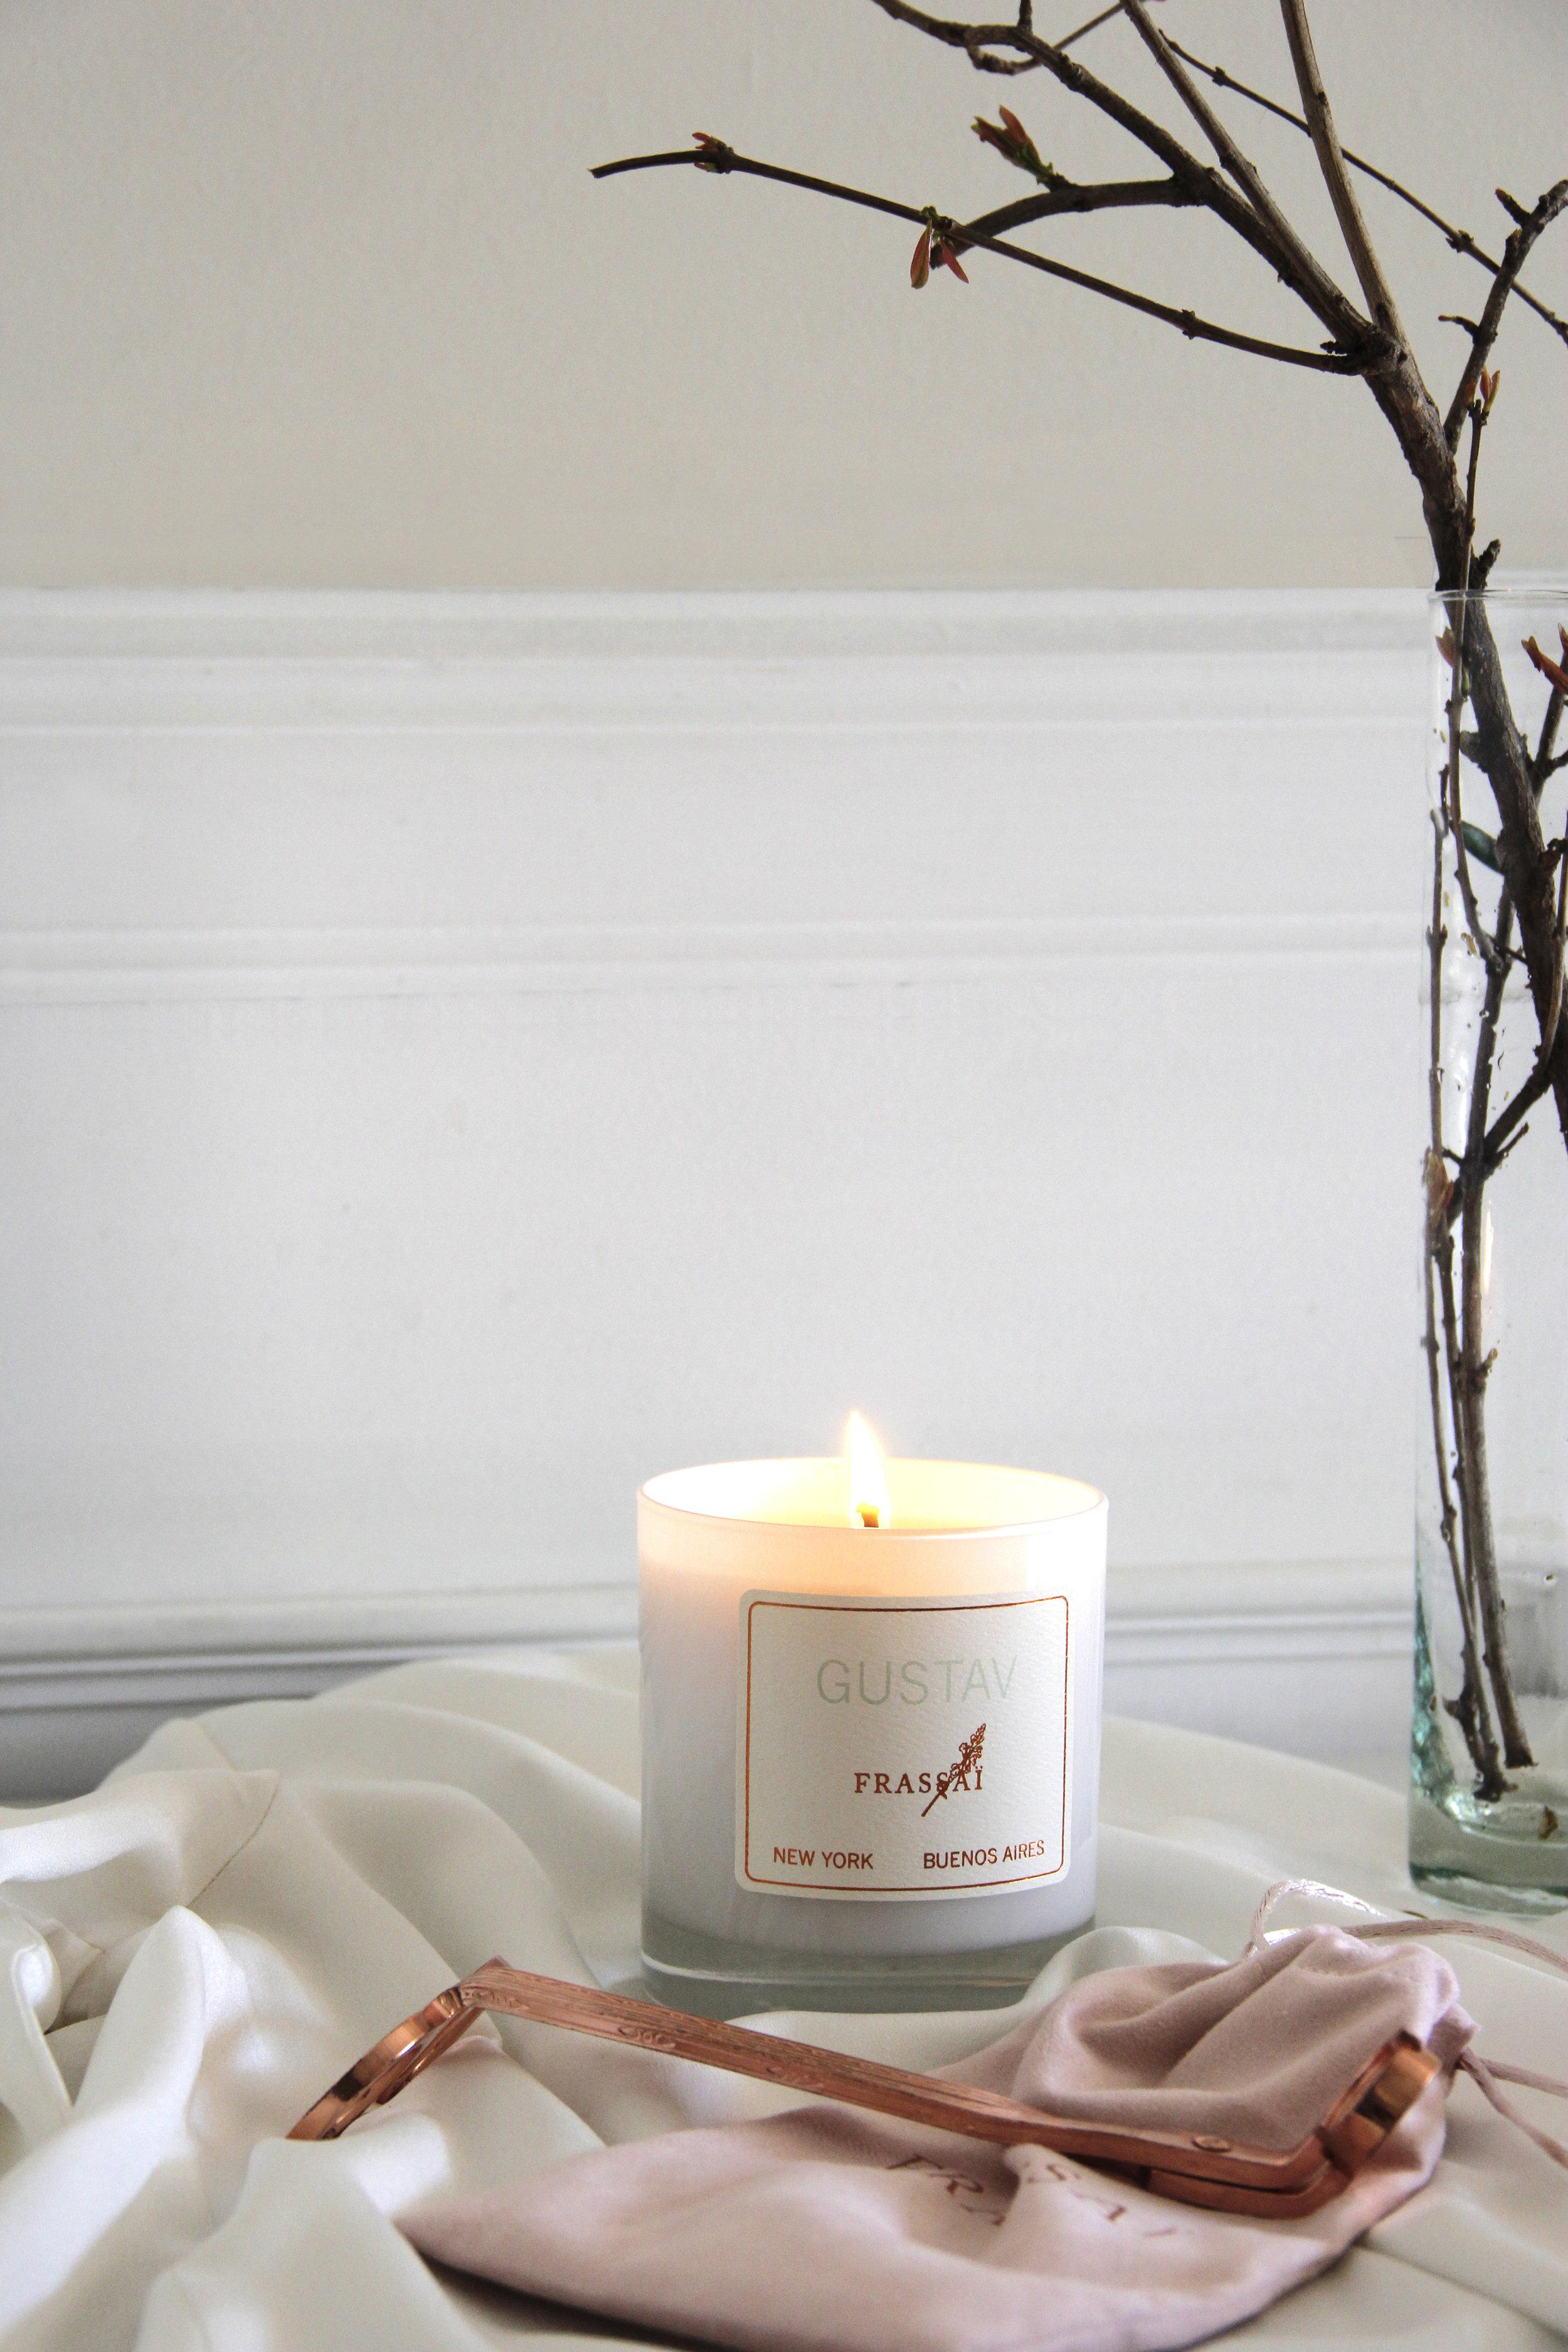 Luxury Candles FRASSAI Gustav scented candle. Photo: Gigi Martino